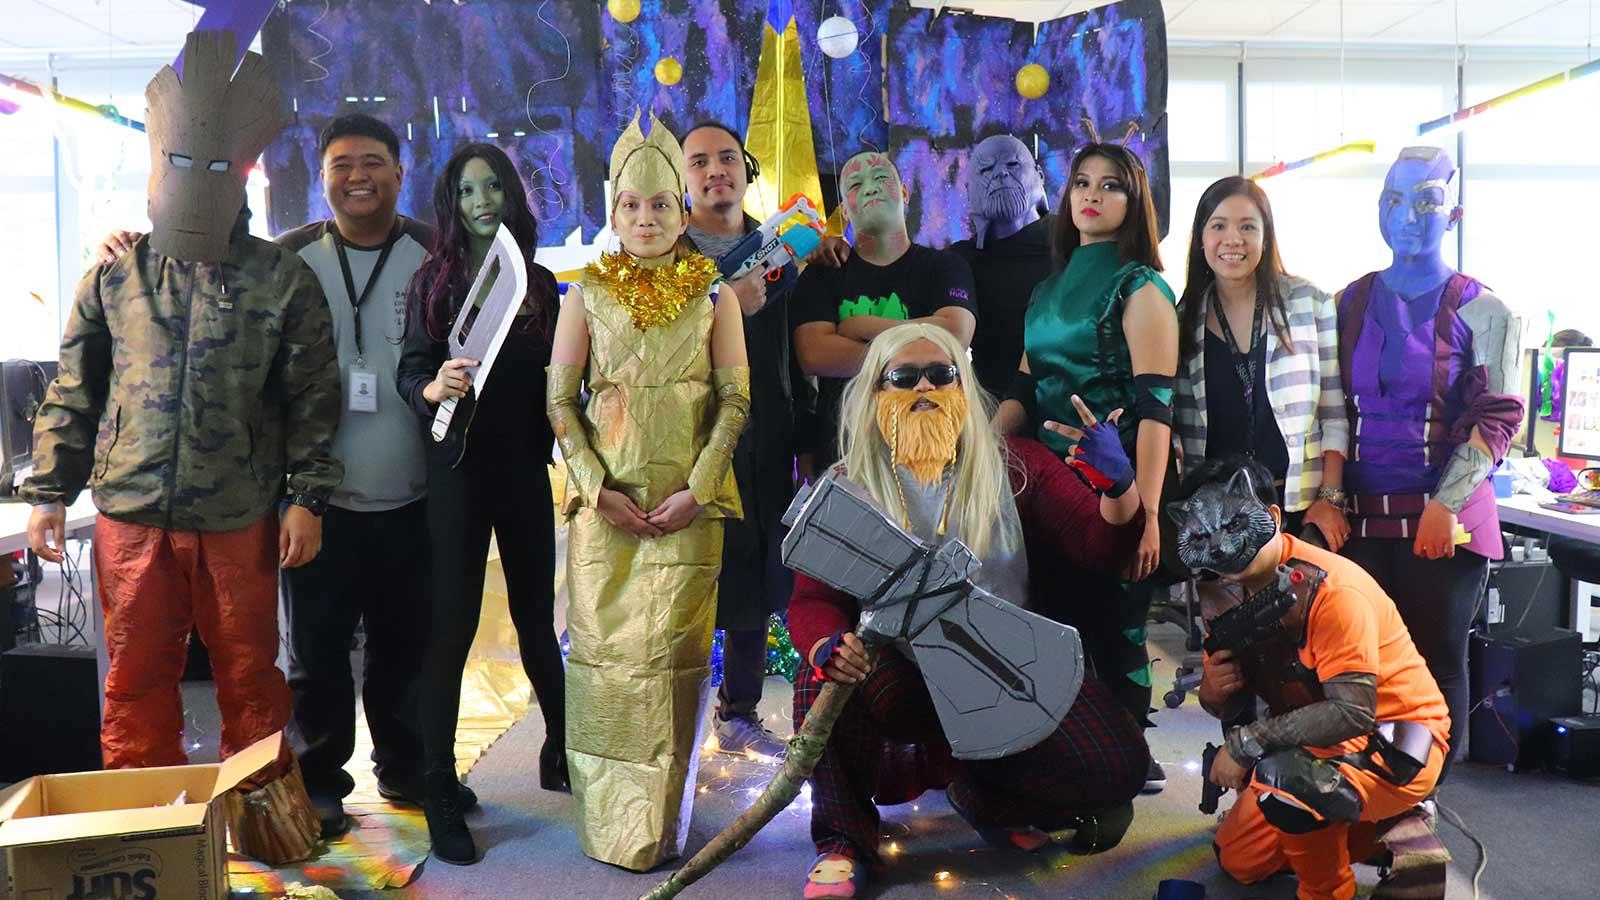 Diversify Halloween Party